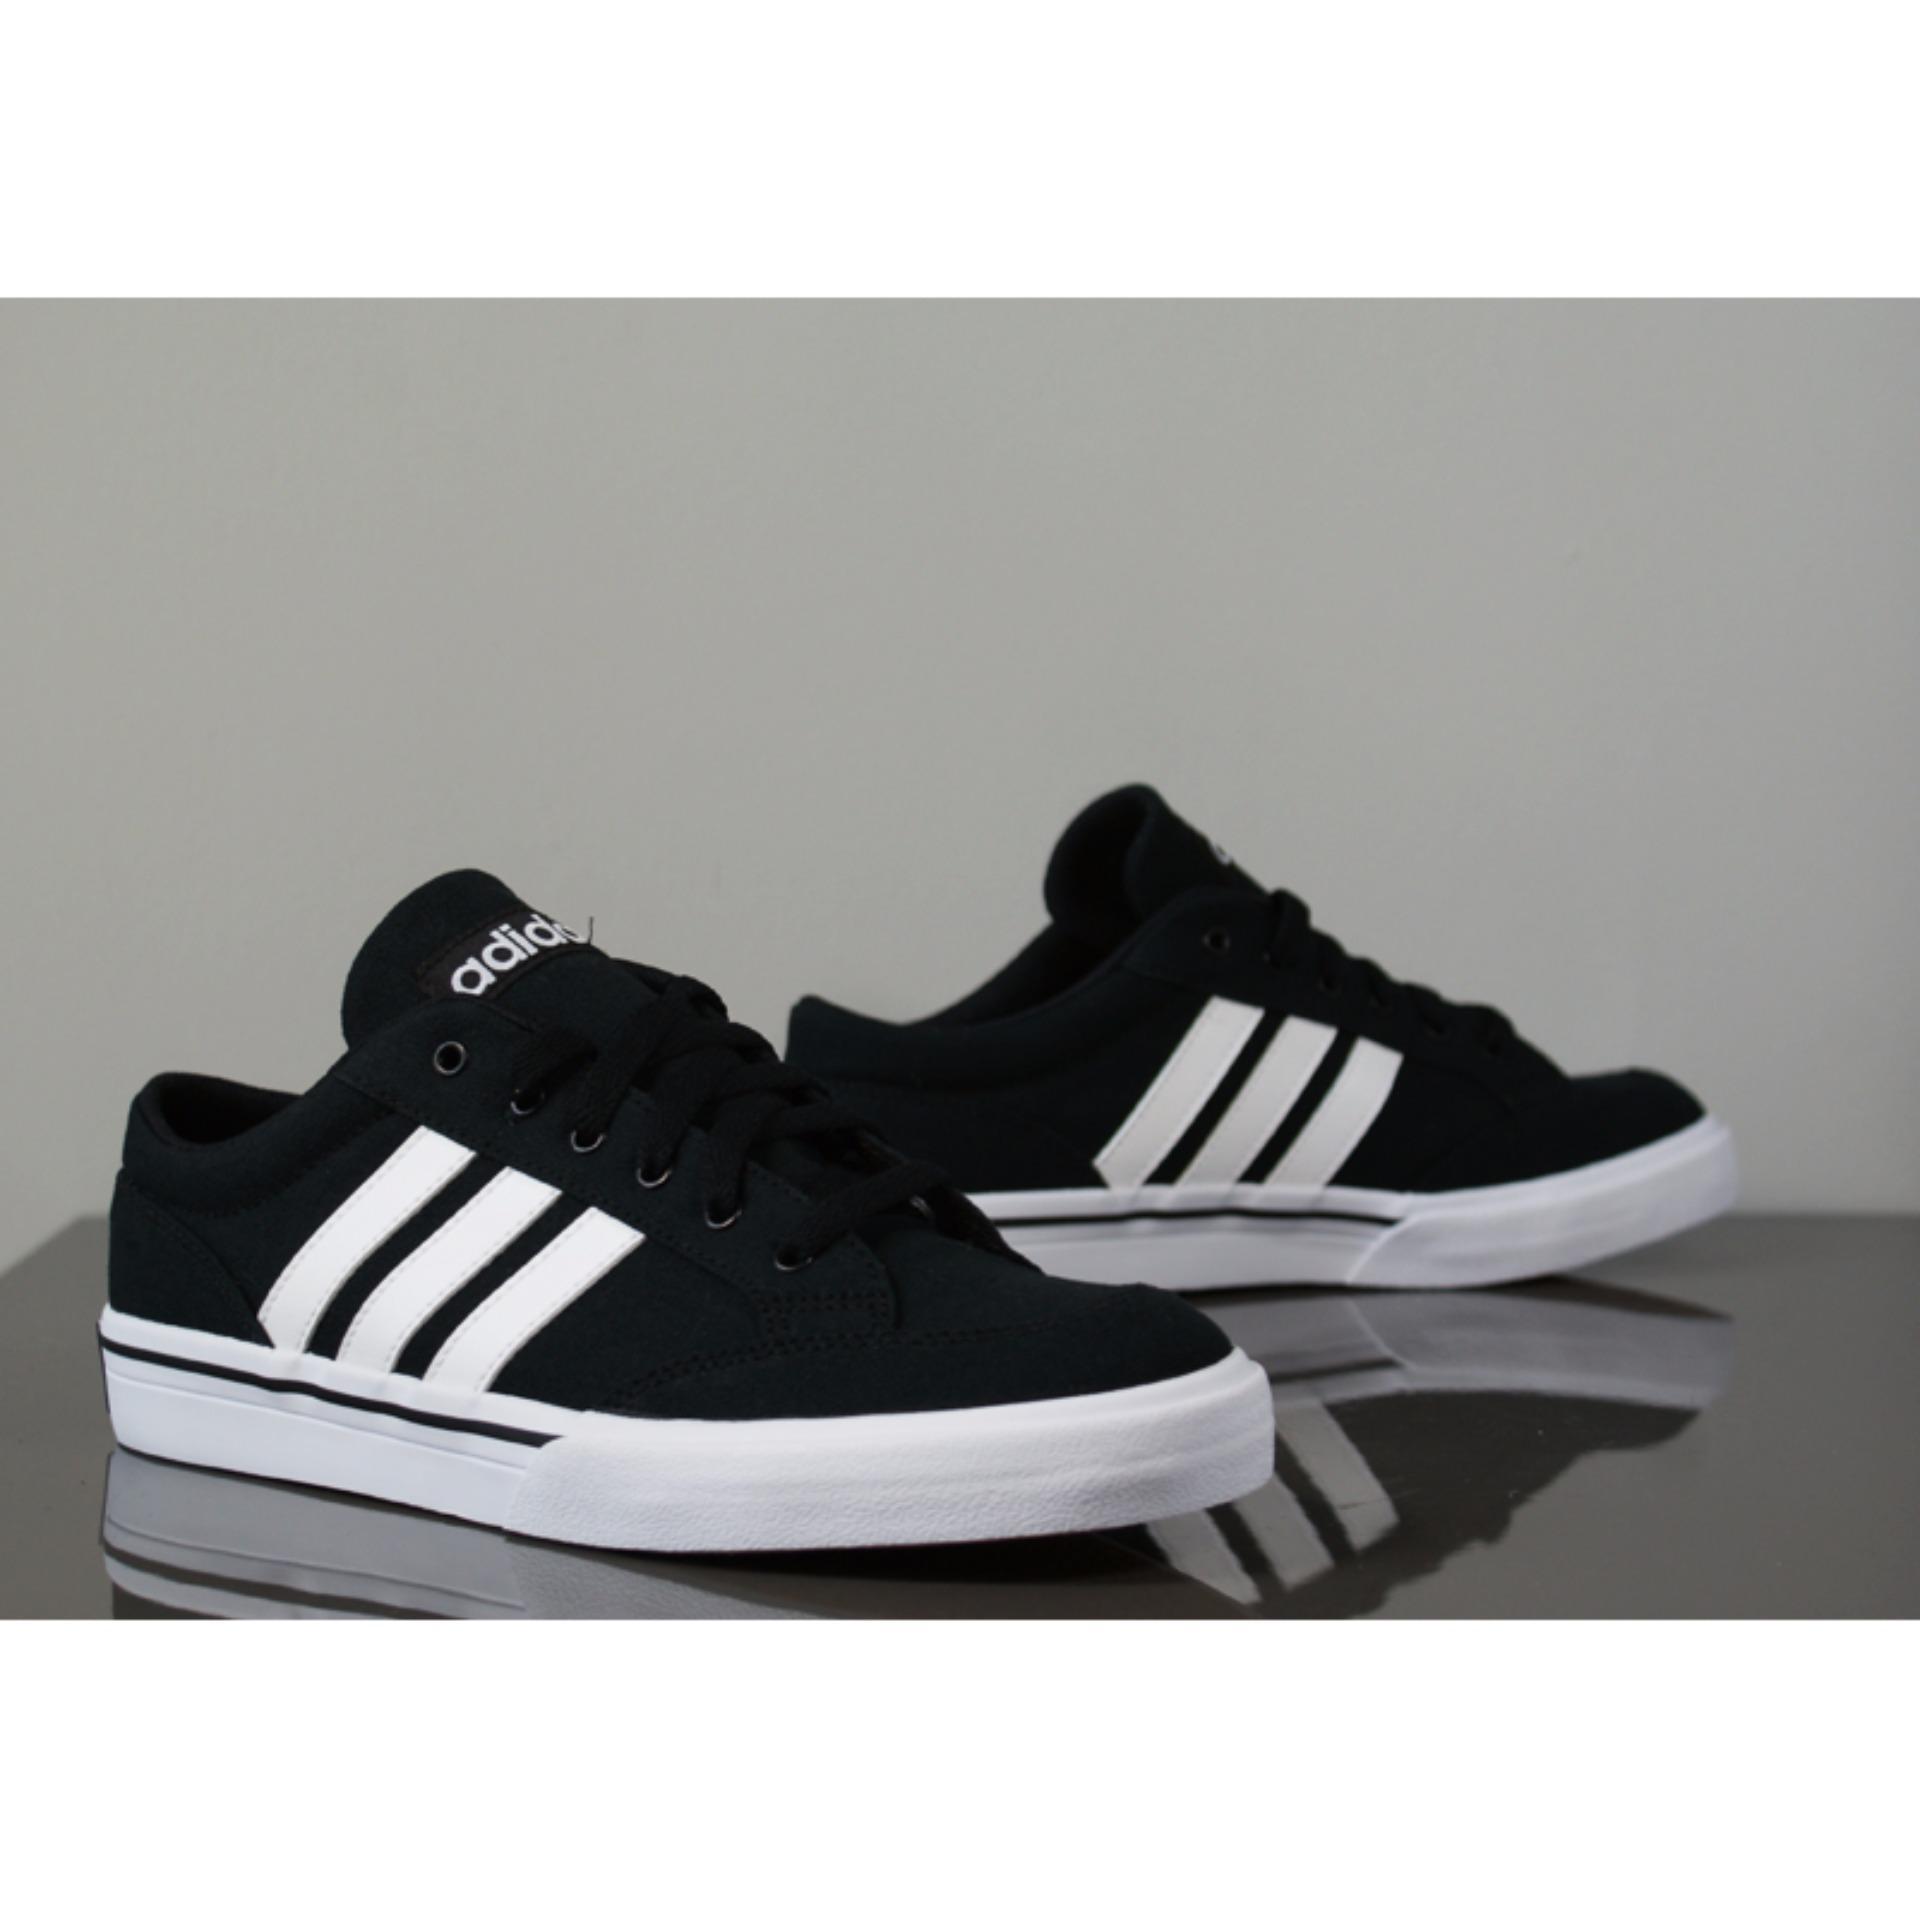 Beli Adidas Sepatu Adineo Gvp Shoes Aw5079 Hitam Murah